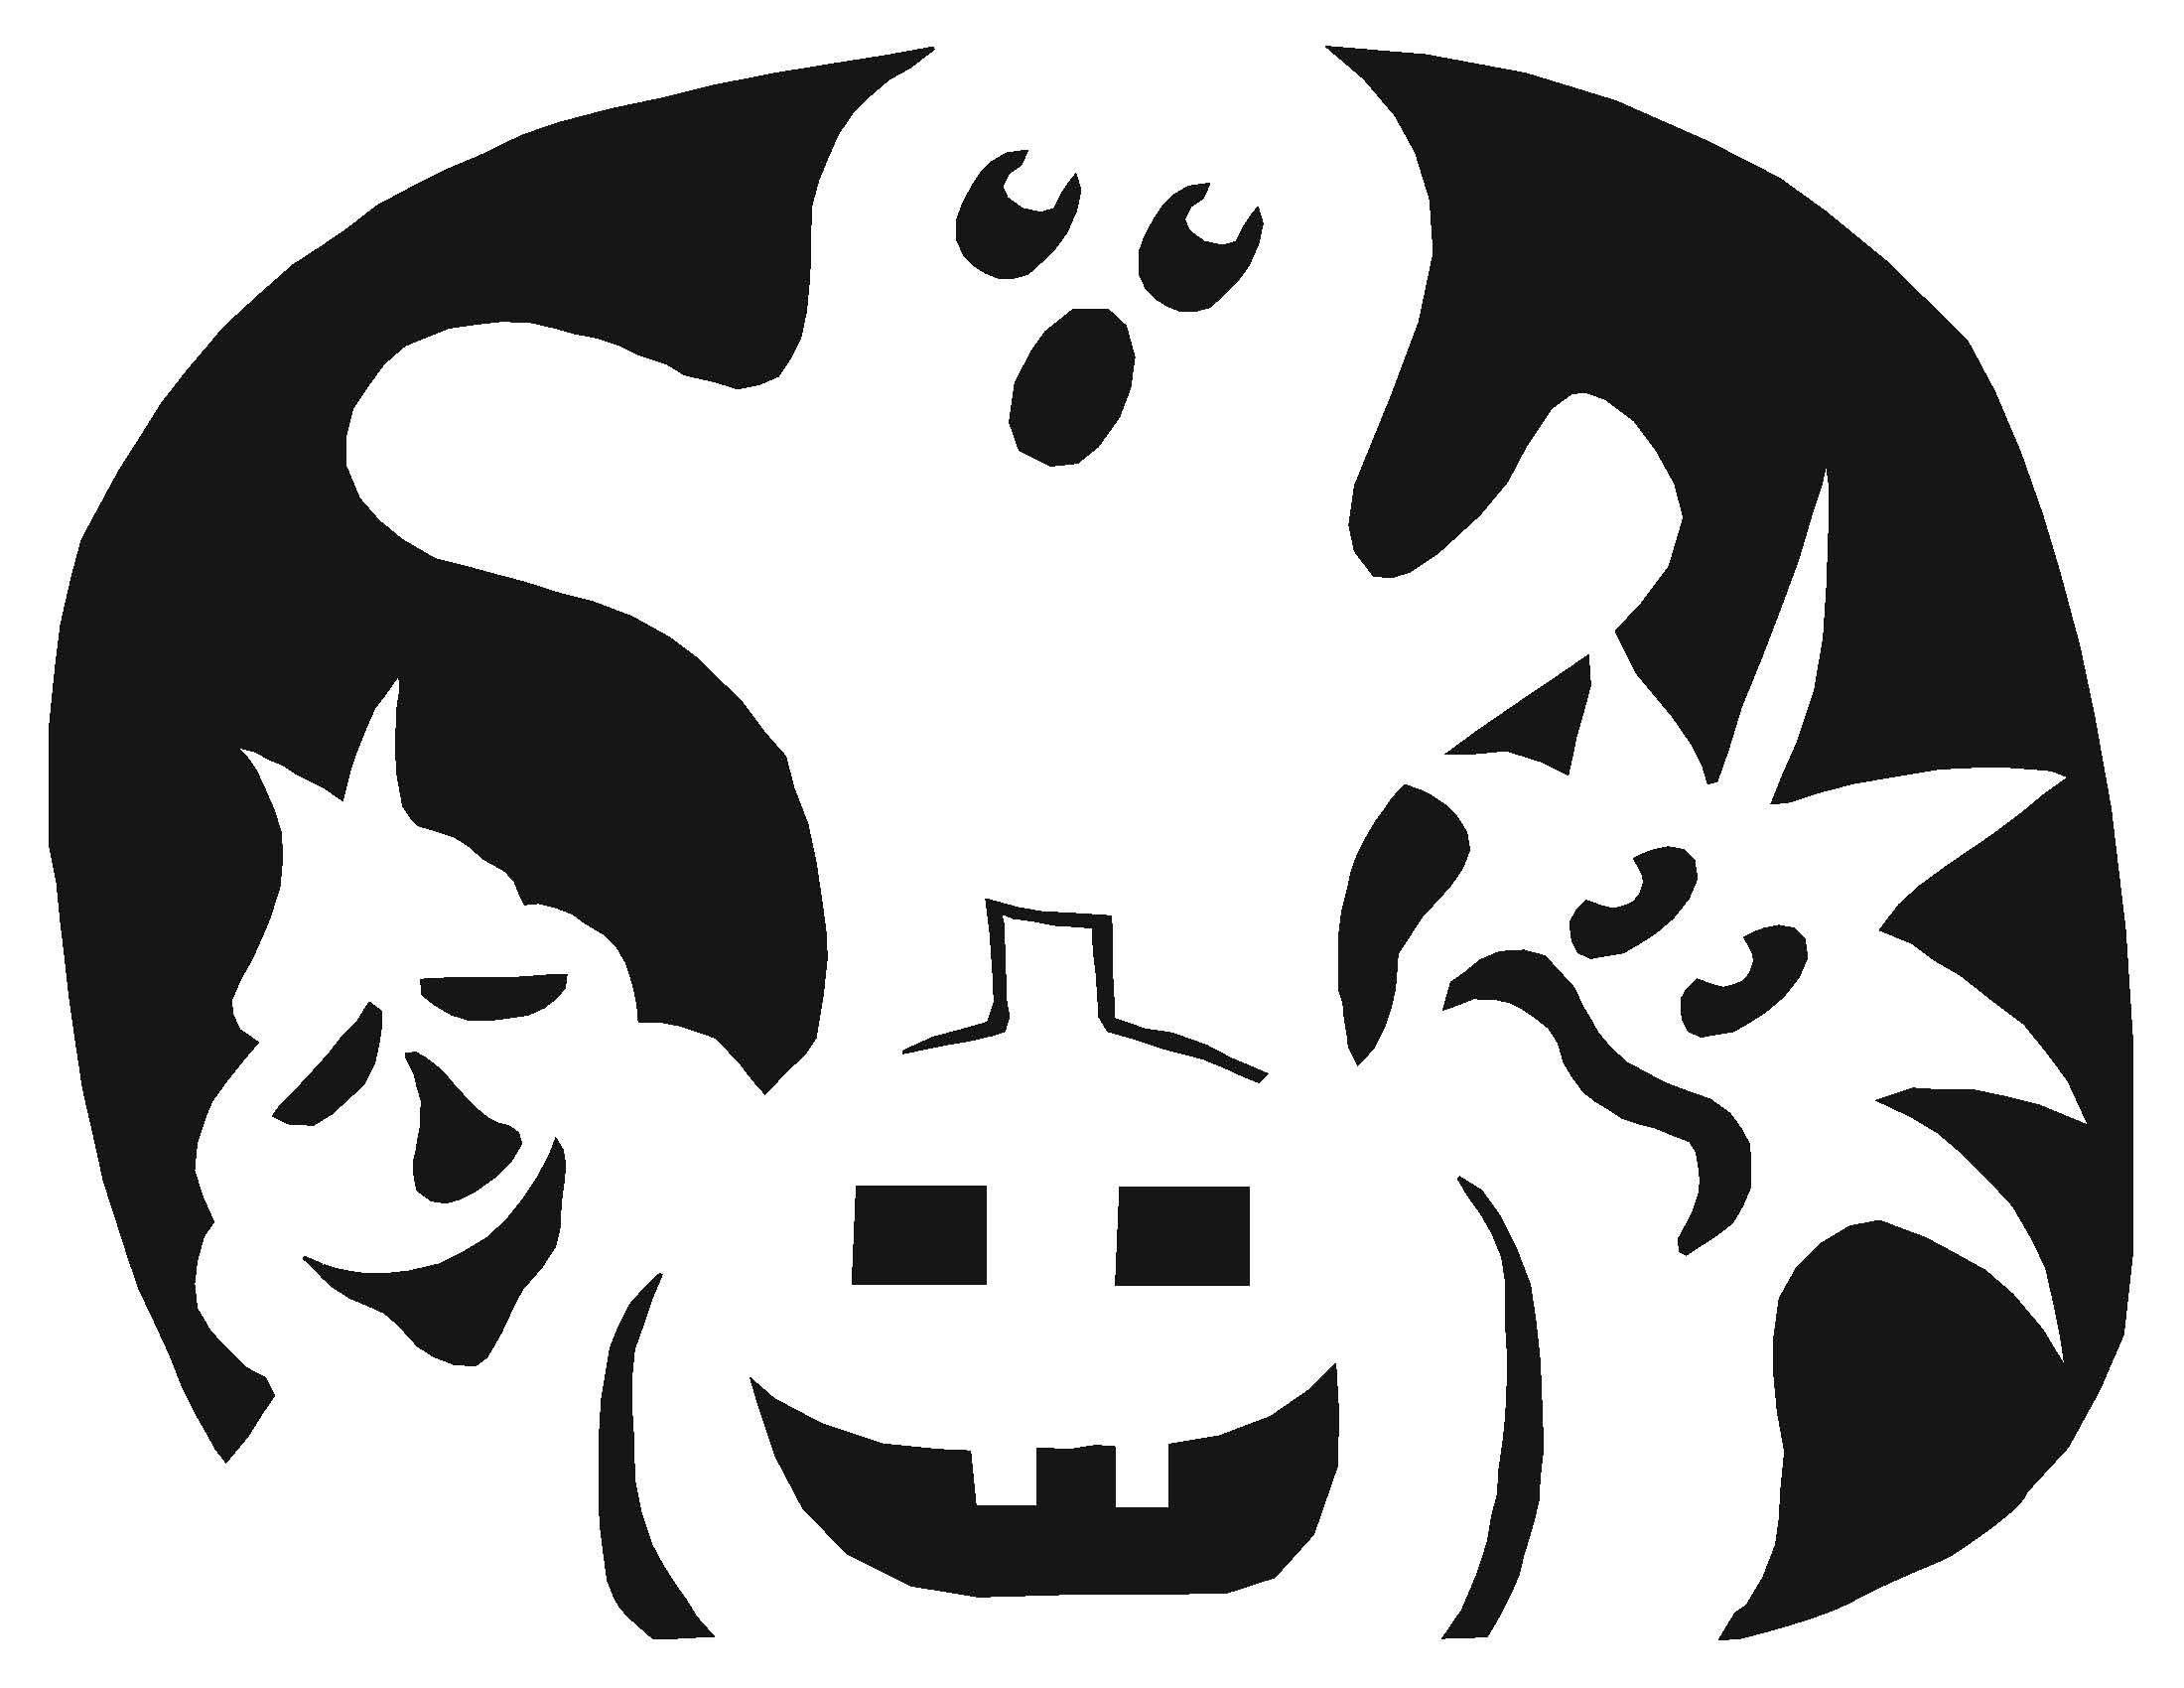 Pumpkin Stencil | All Hallows Eve | Pumpkin Carving Templates - Free Printable Pumpkin Faces